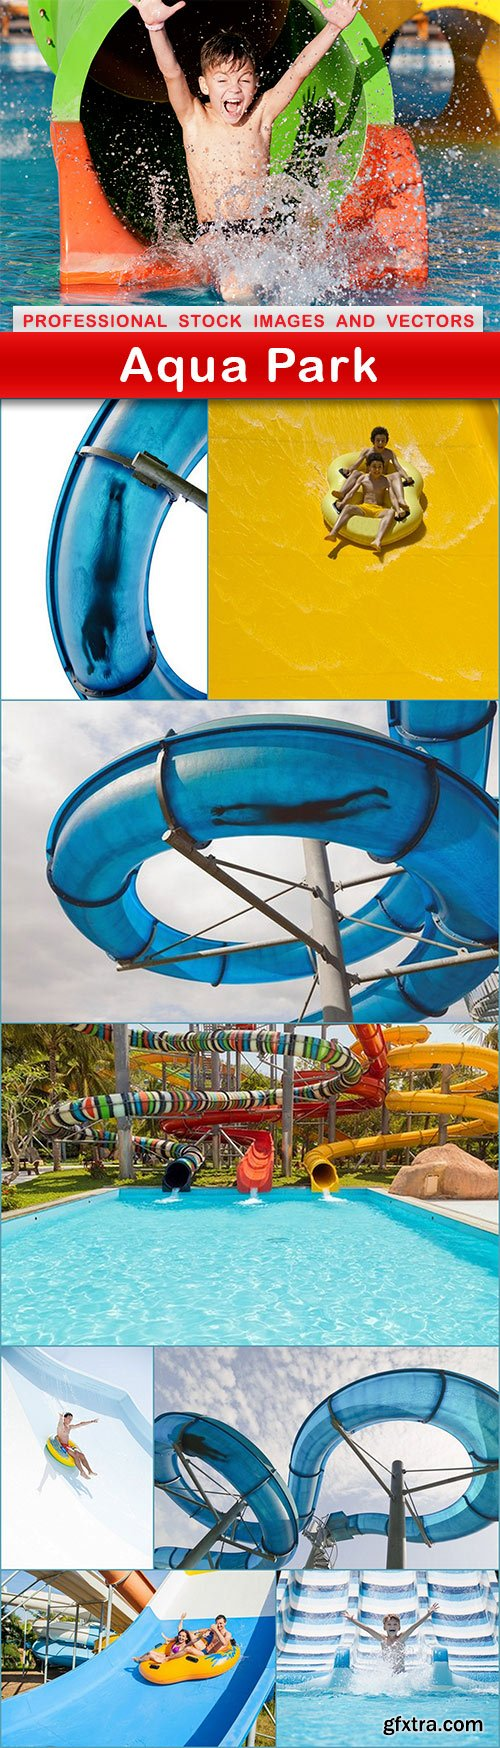 Aqua Park - 9 UHQ JPEG